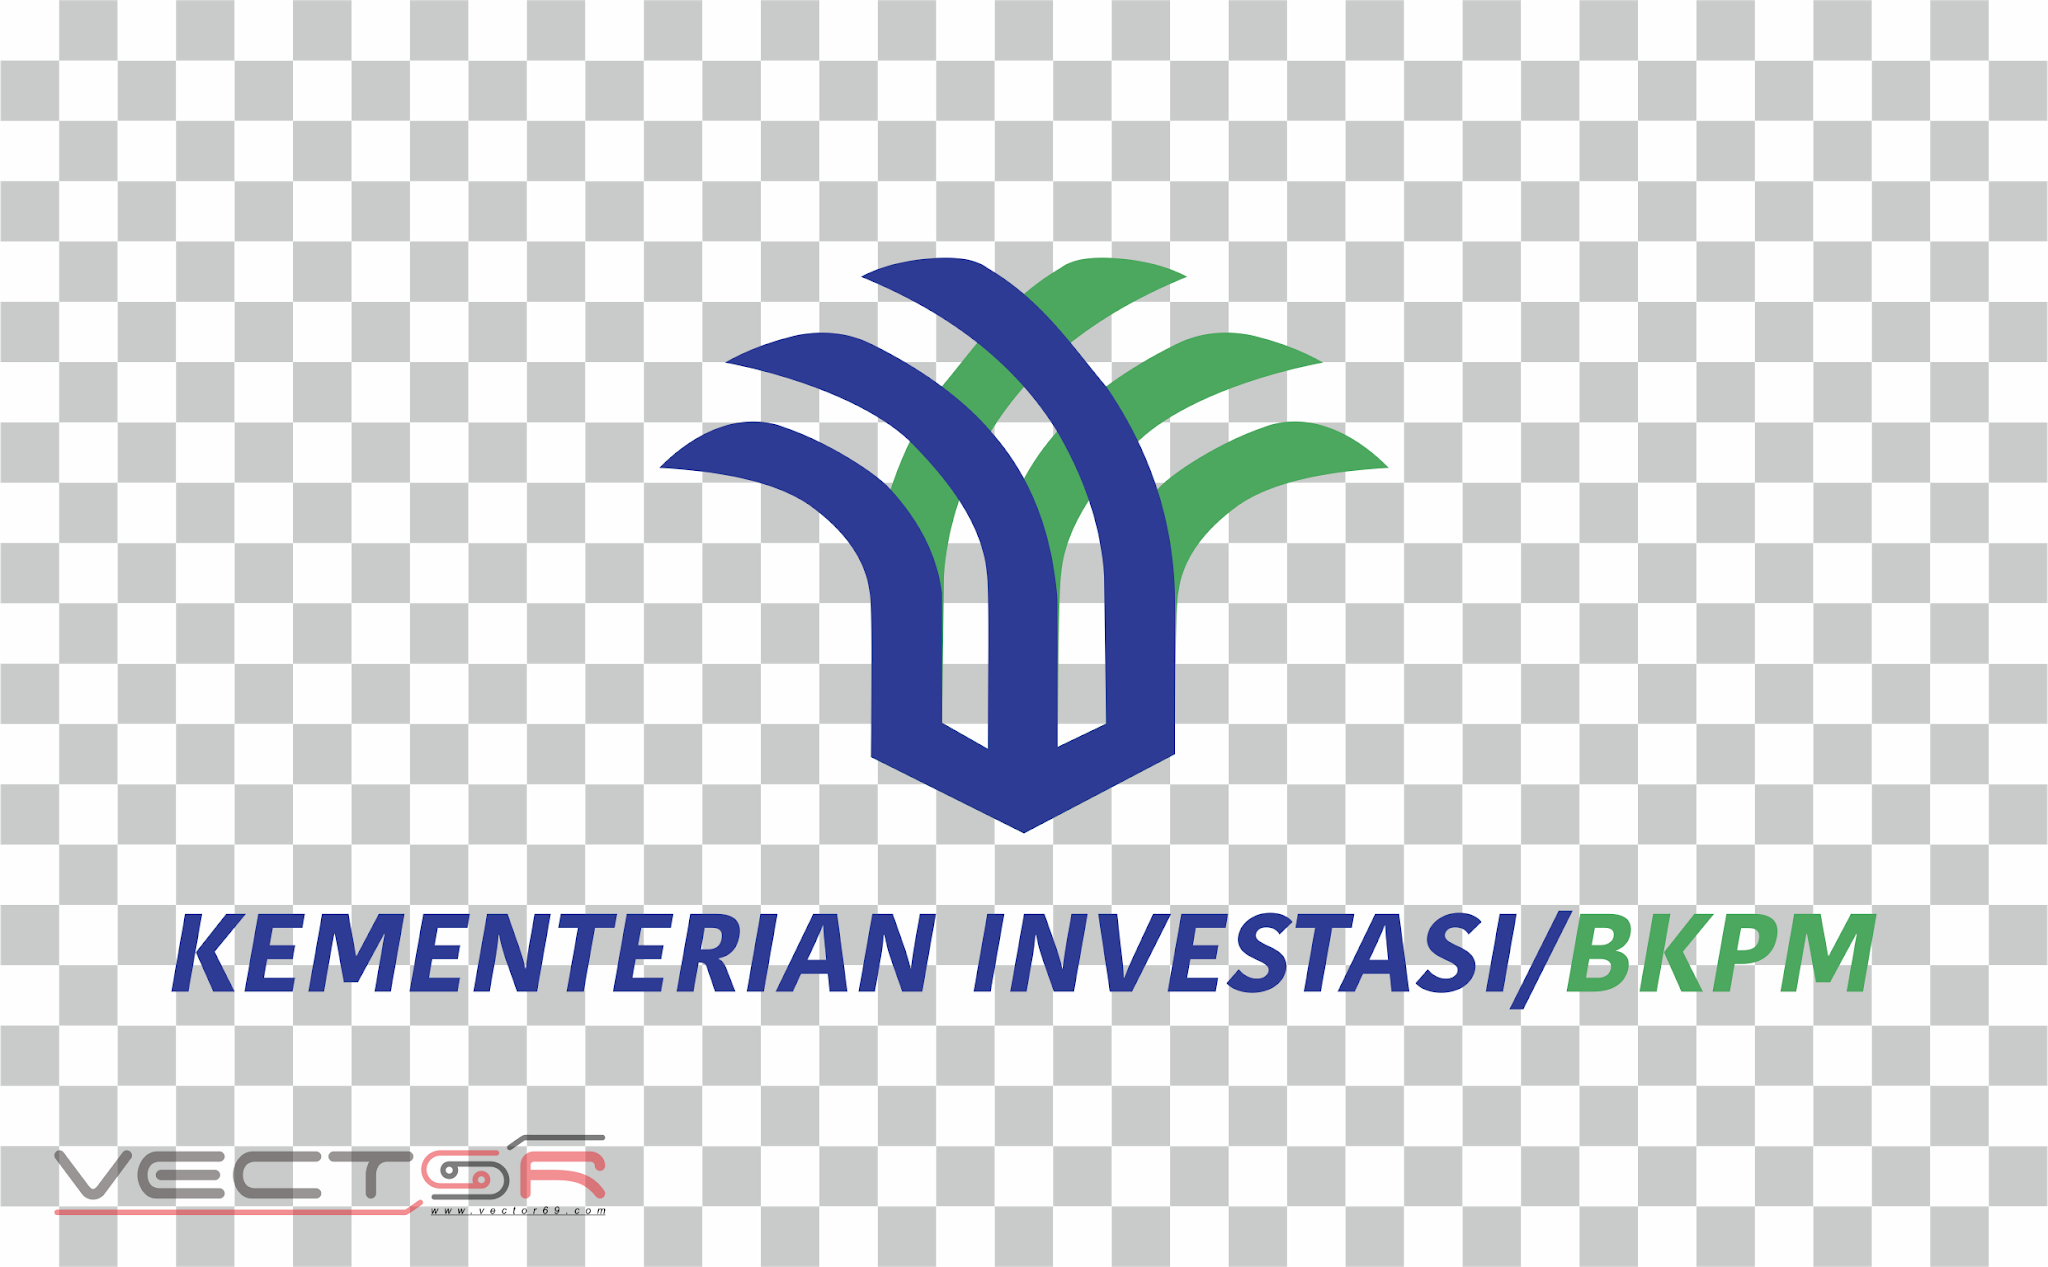 Logo Kementerian Investasi/BKPM - Download .PNG (Portable Network Graphics) Transparent Images